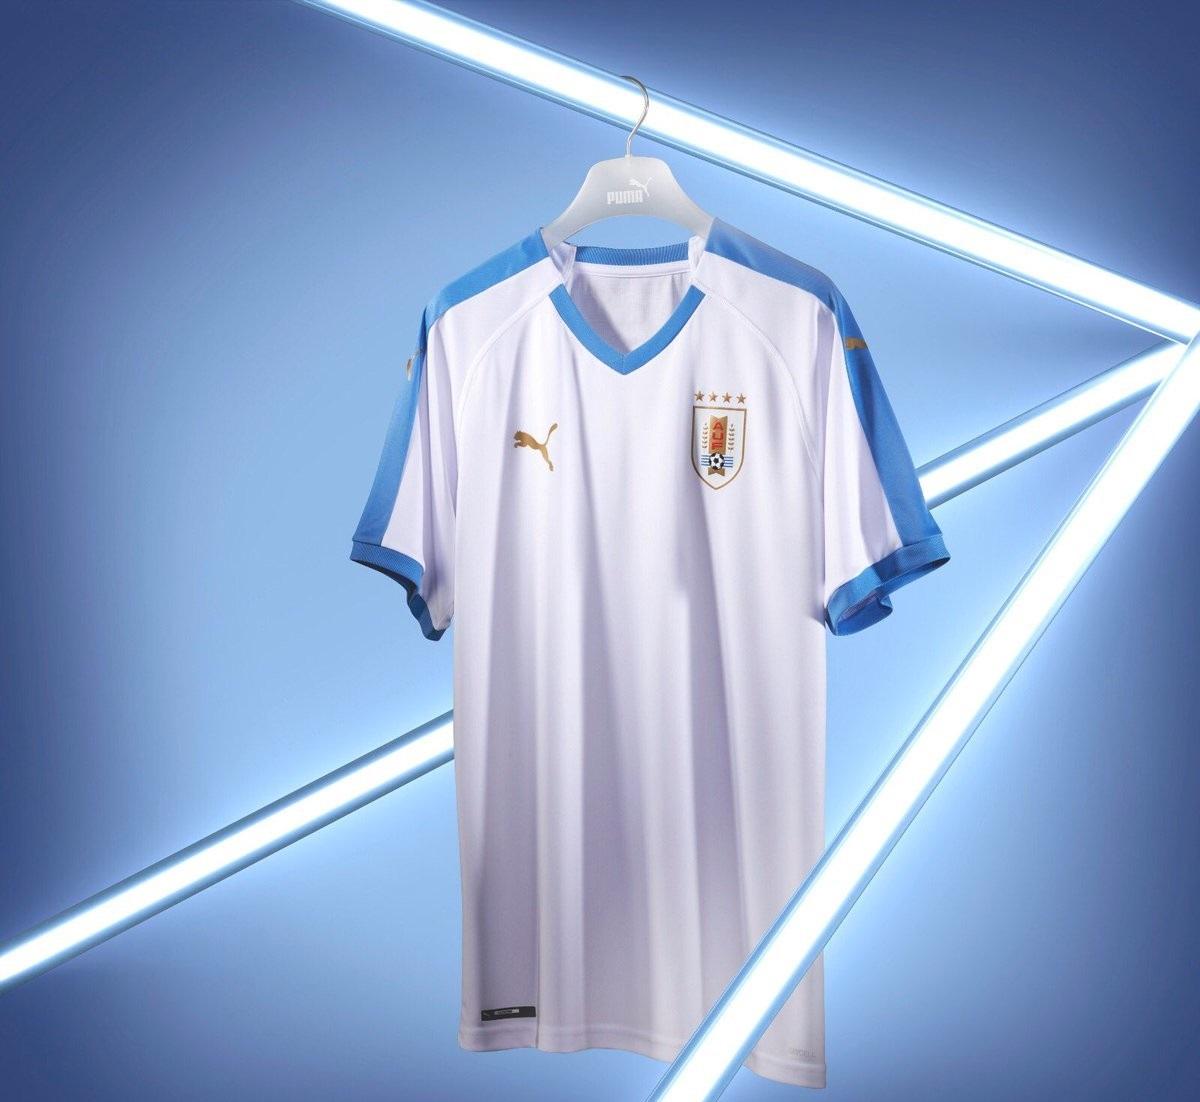 Uruguay 2019 maillot exterieur Copa America 2019